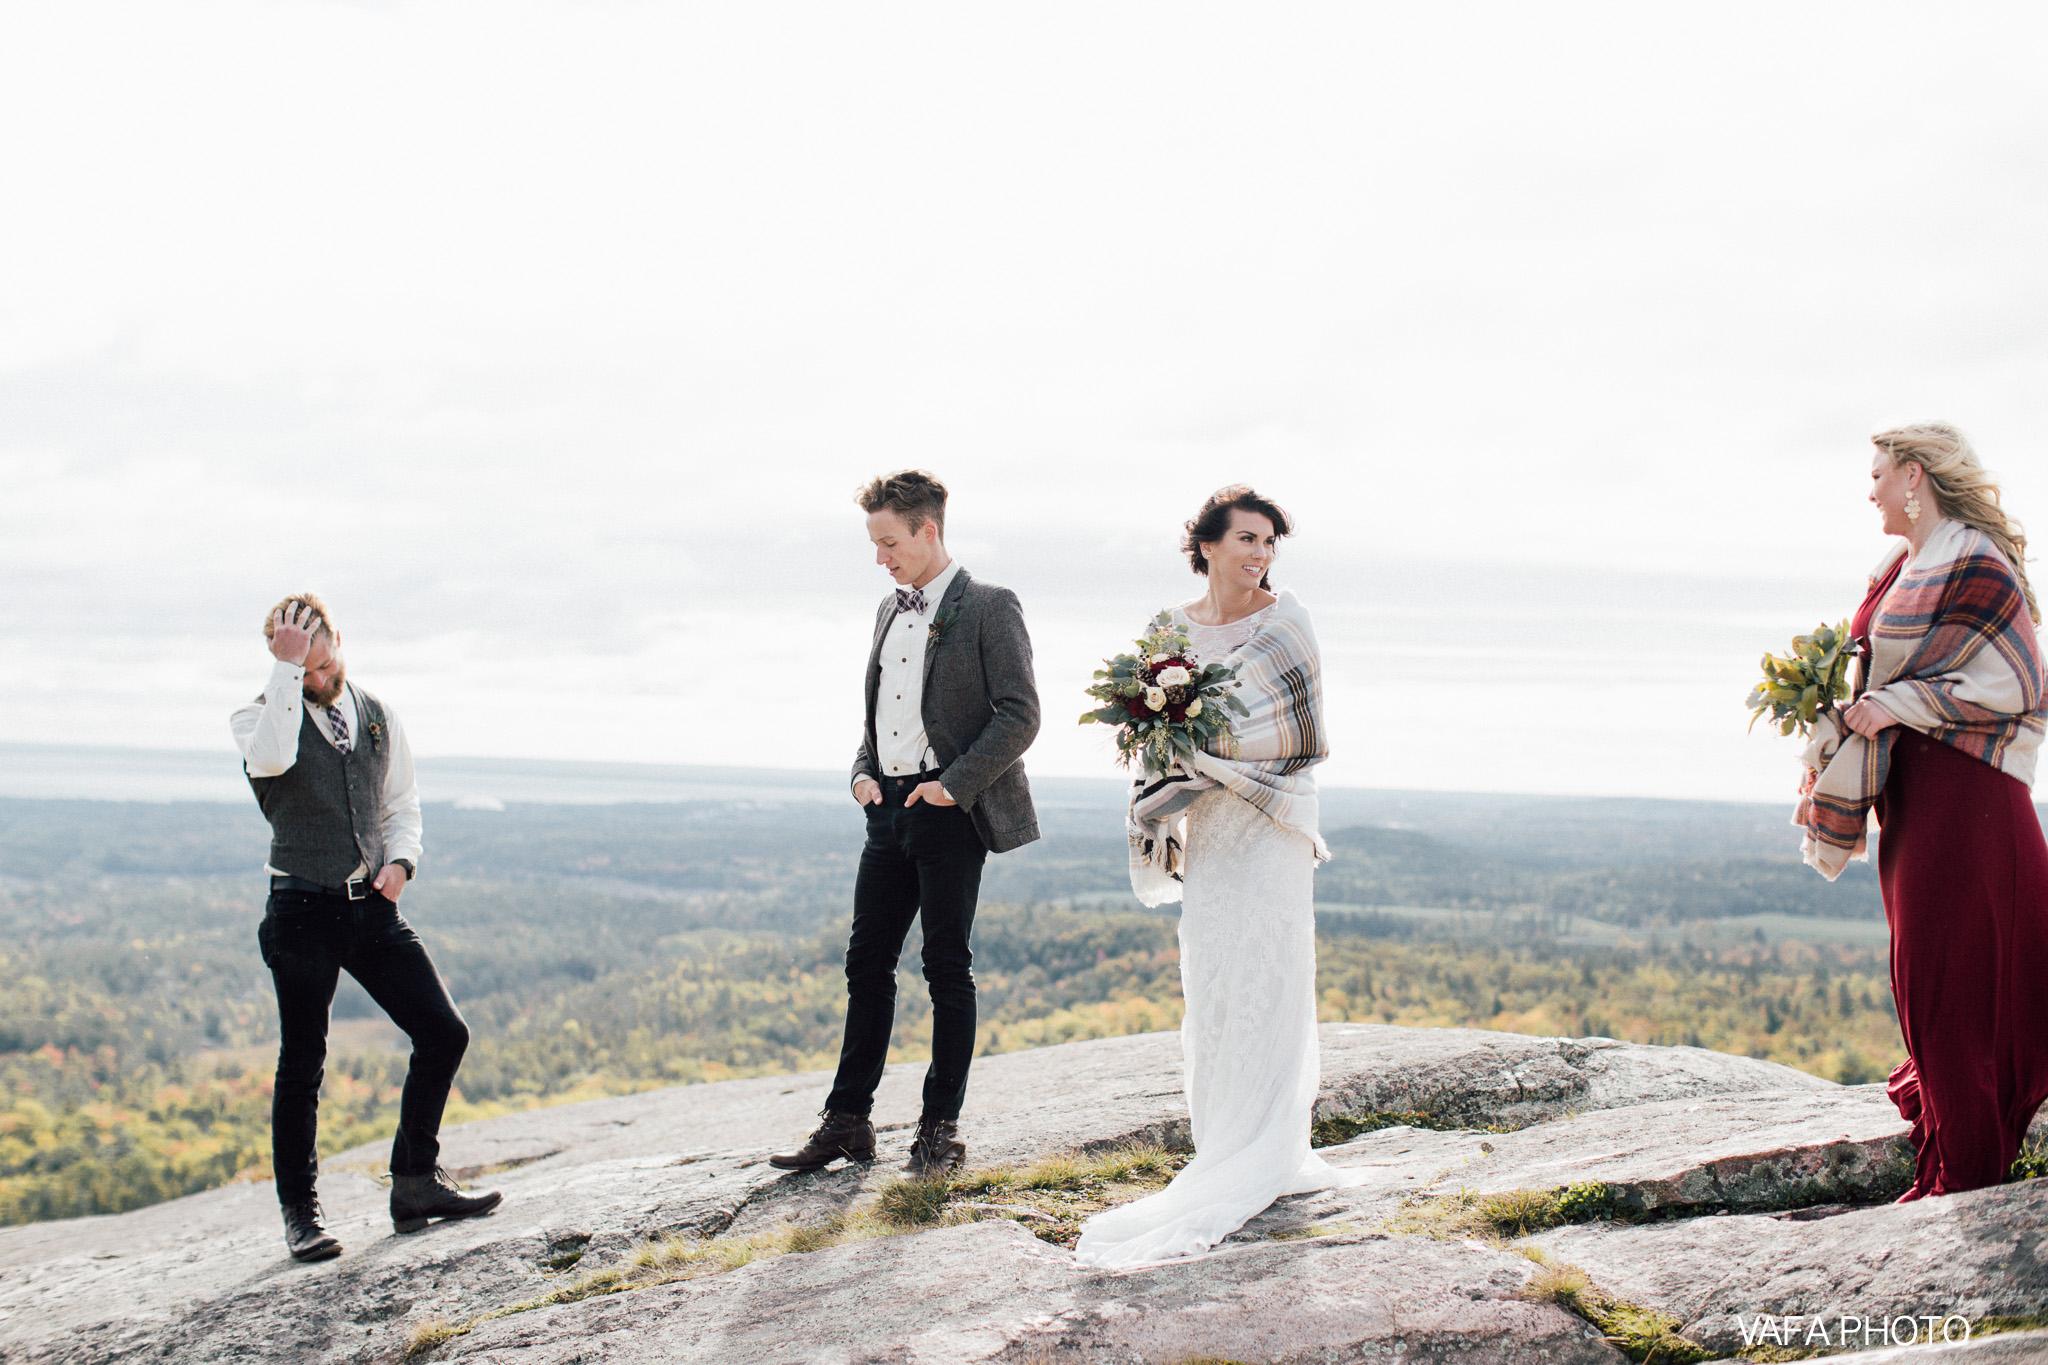 Hogback-Mountain-Wedding-Chelsea-Josh-Vafa-Photo-386.jpg